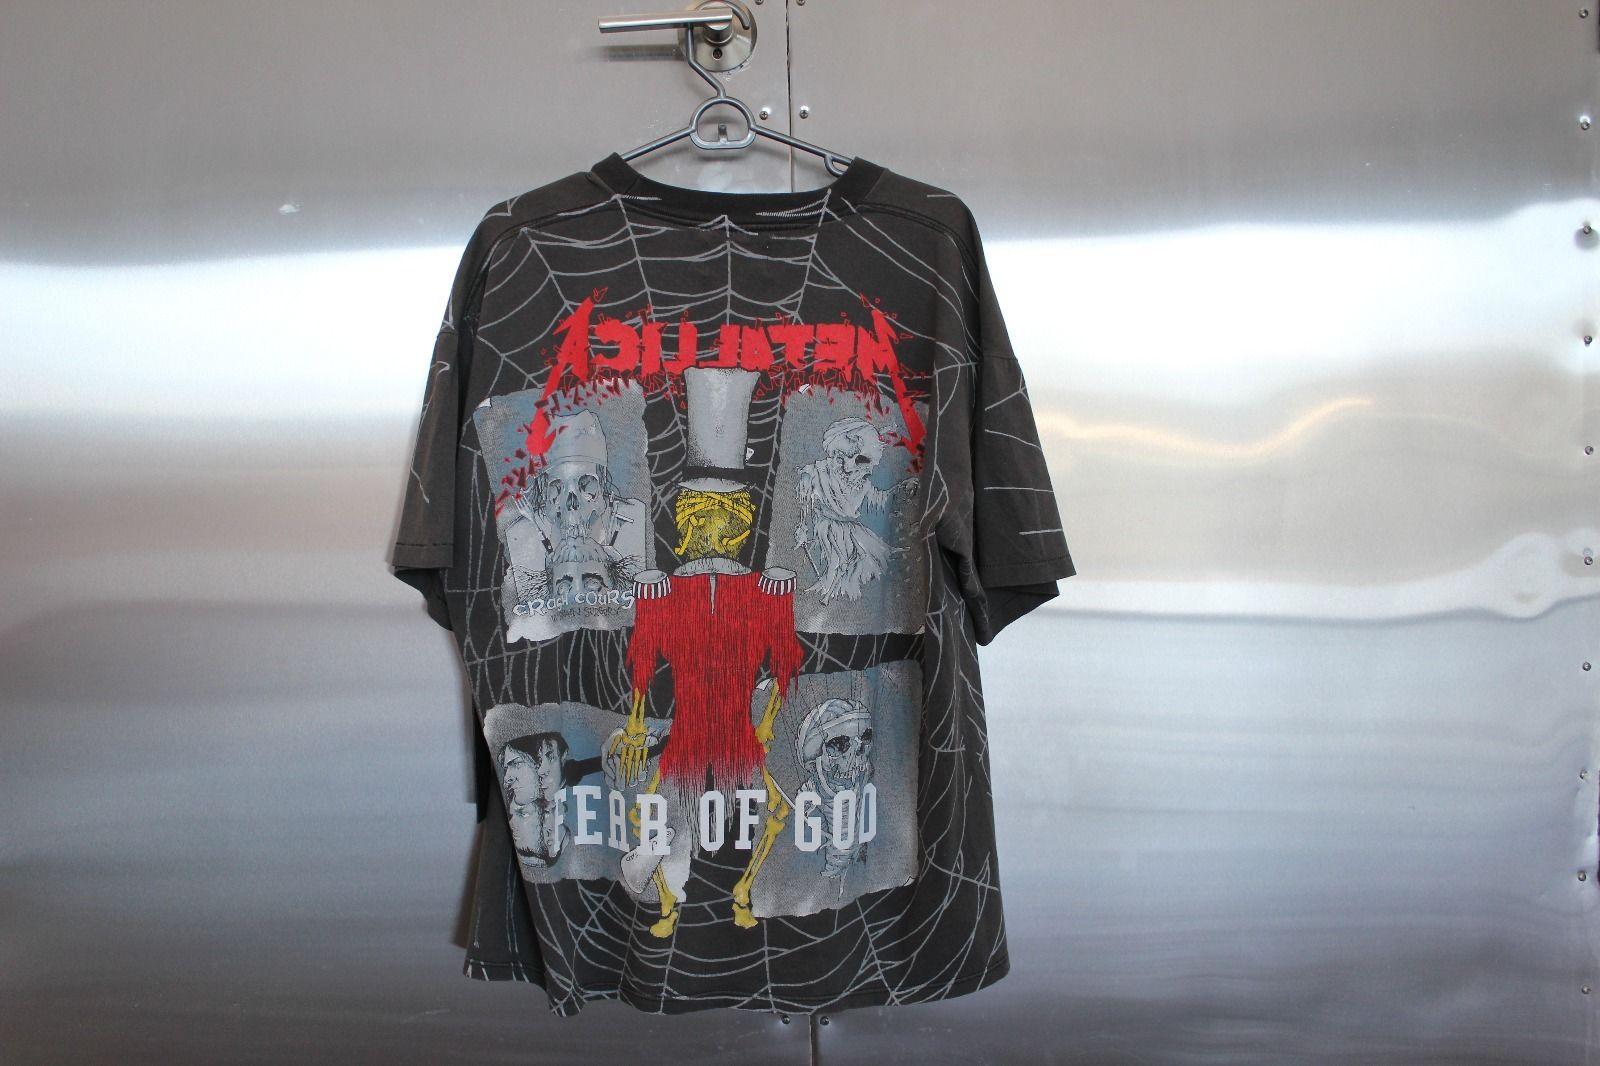 b9ad926c81de Fear of God x RSVP Gallery - Metallica Resurrected Vintage Pushead ...